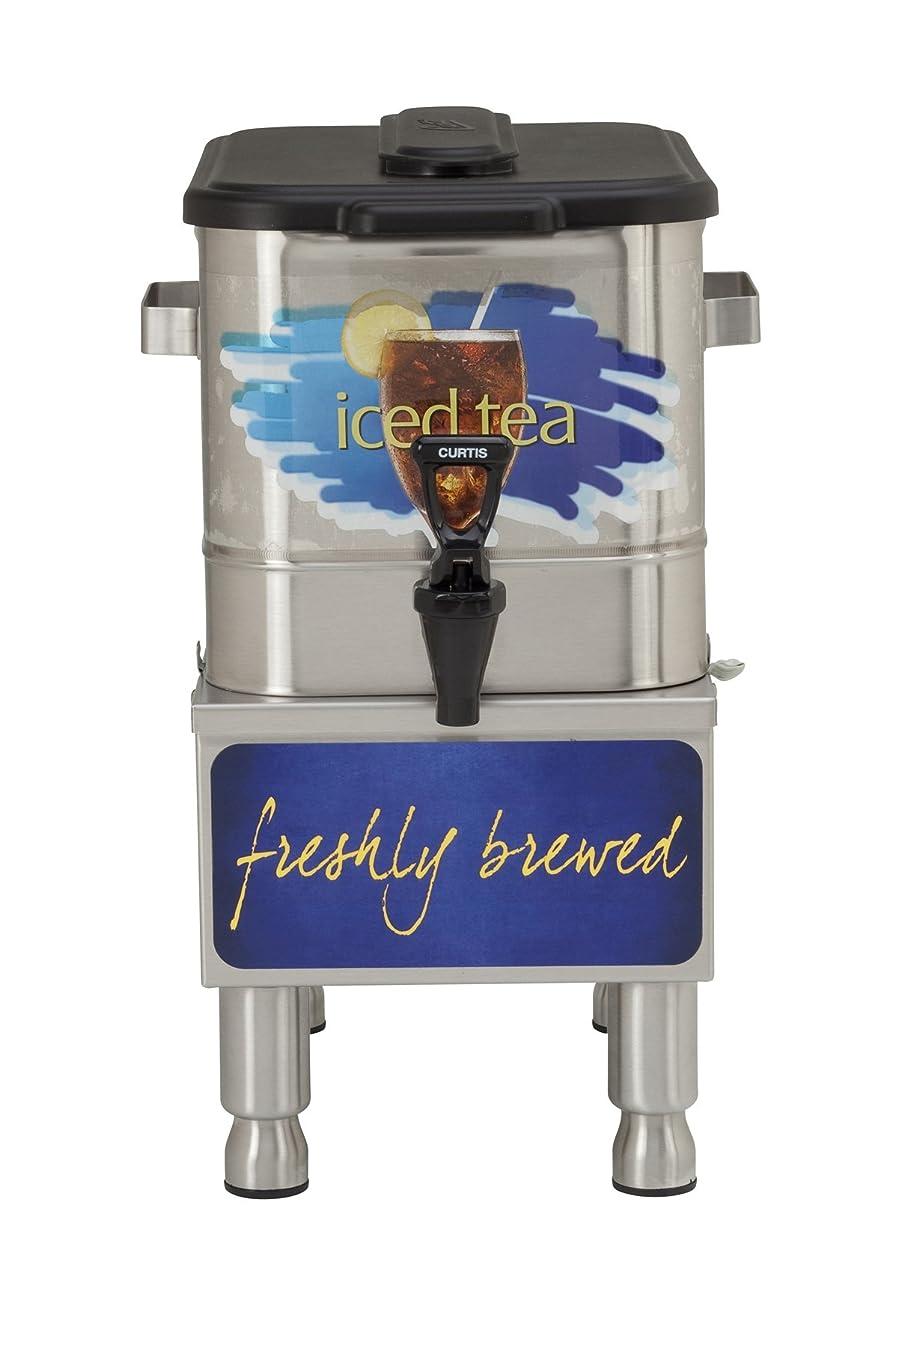 Wilbur Curtis Iced Tea Dispenser Remote Stand For Tco308 Tea Dispenser - Designed to Preserve Flavor - TCORS000 (Each)